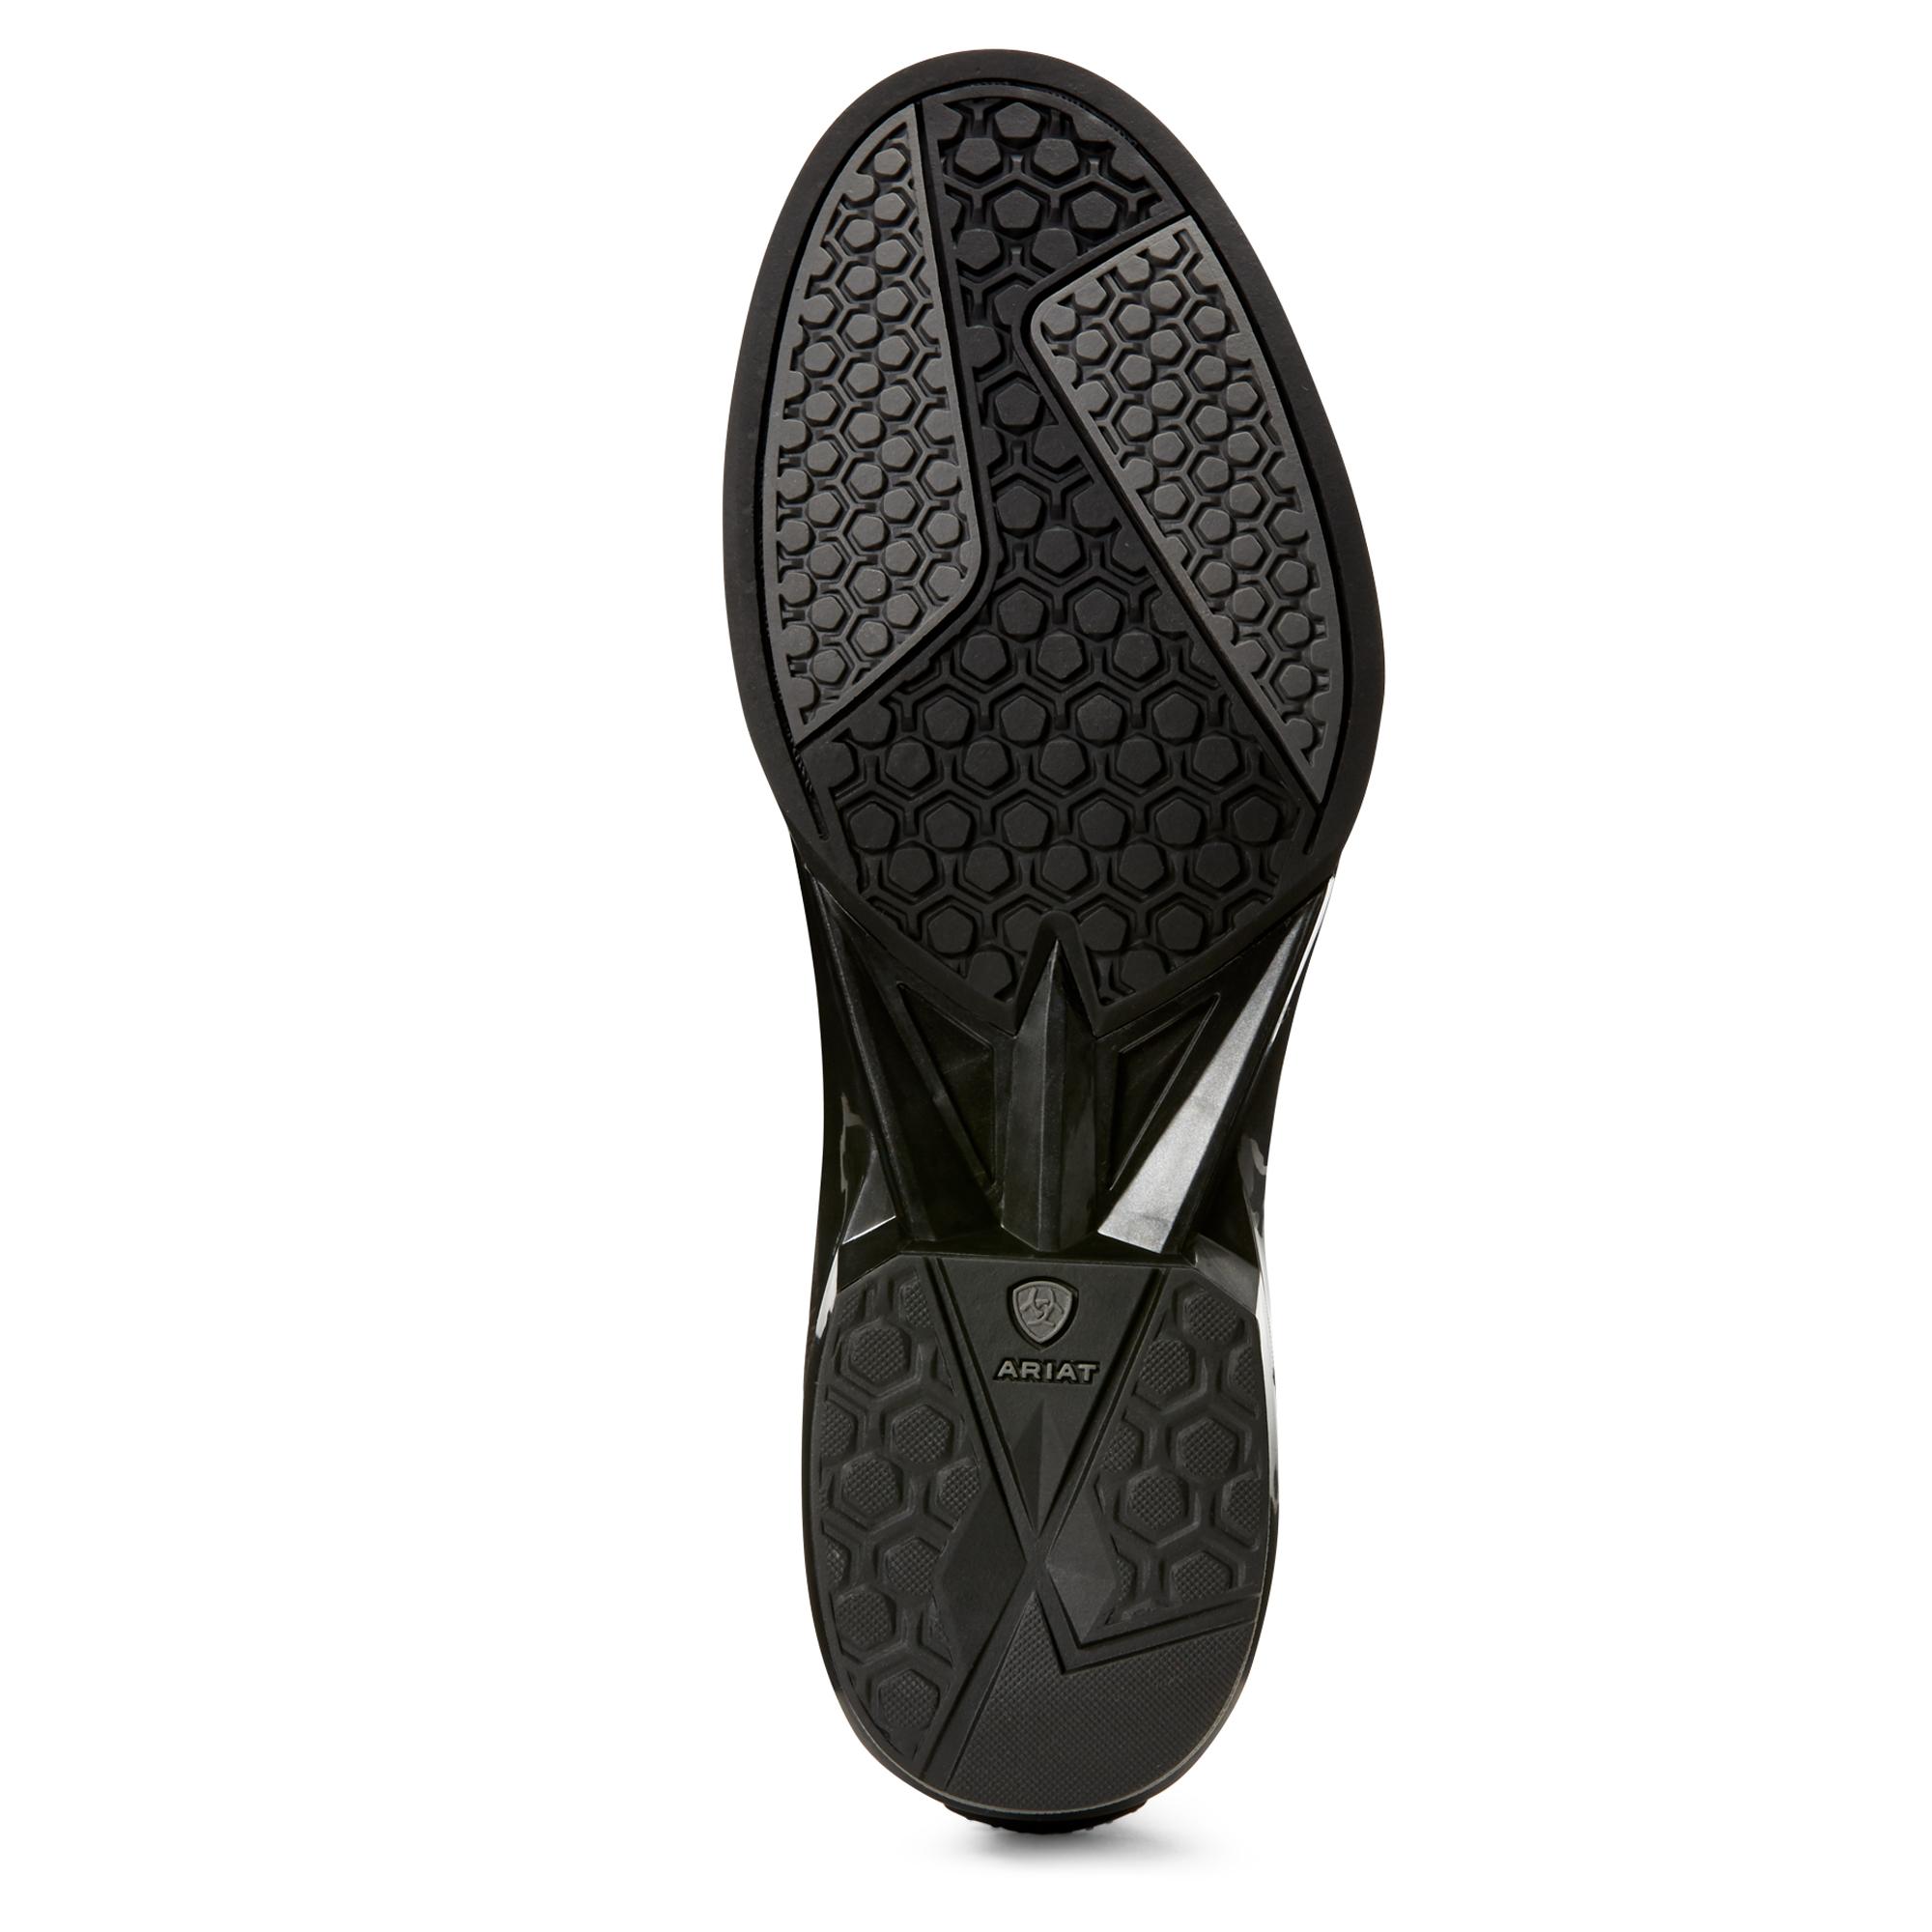 Ariat Devon Nitro Womens Zip Paddock Boots Waxed Chocolate